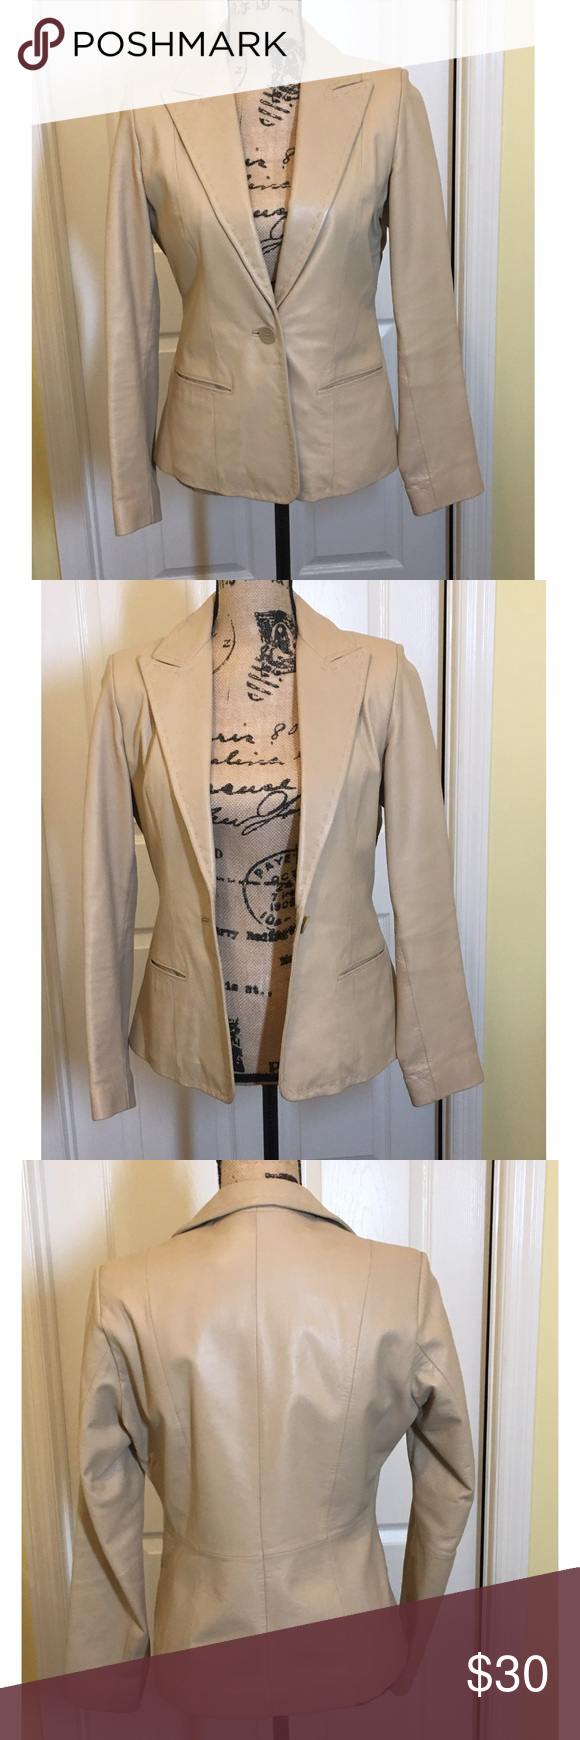 Pelle Studio Wilsons Leather Jacket in 2020 Wilsons